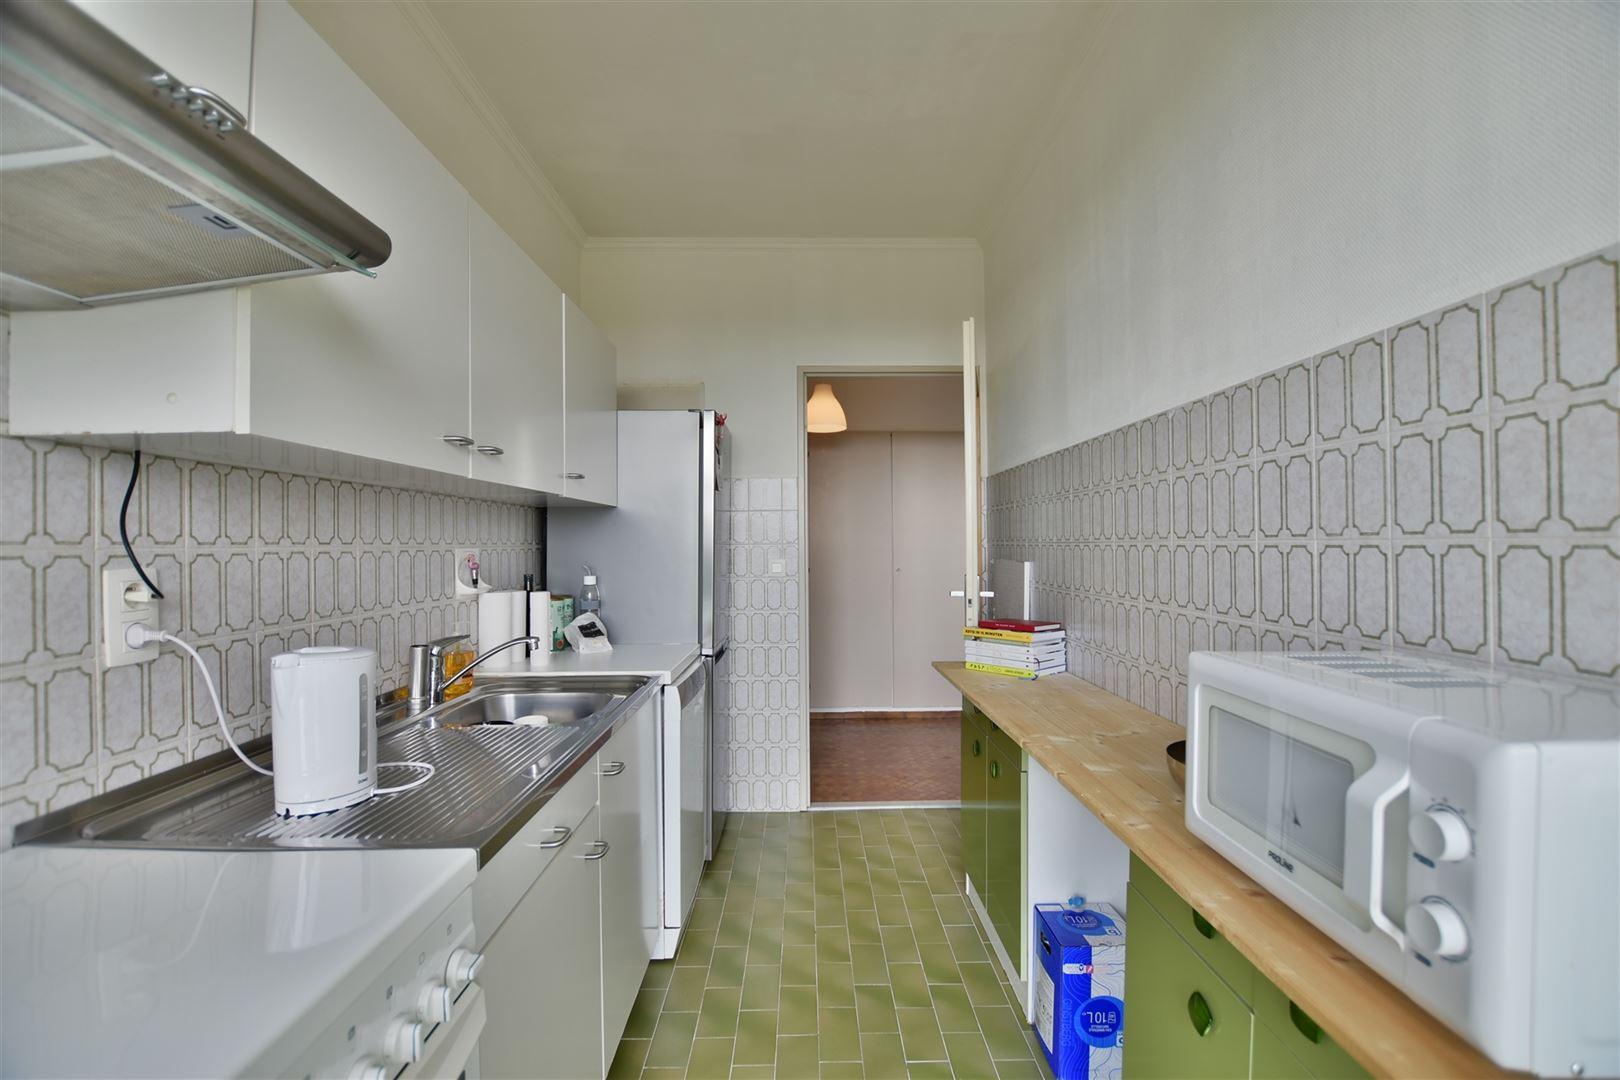 Foto 10 : Appartement te 9200 DENDERMONDE (België) - Prijs € 169.000